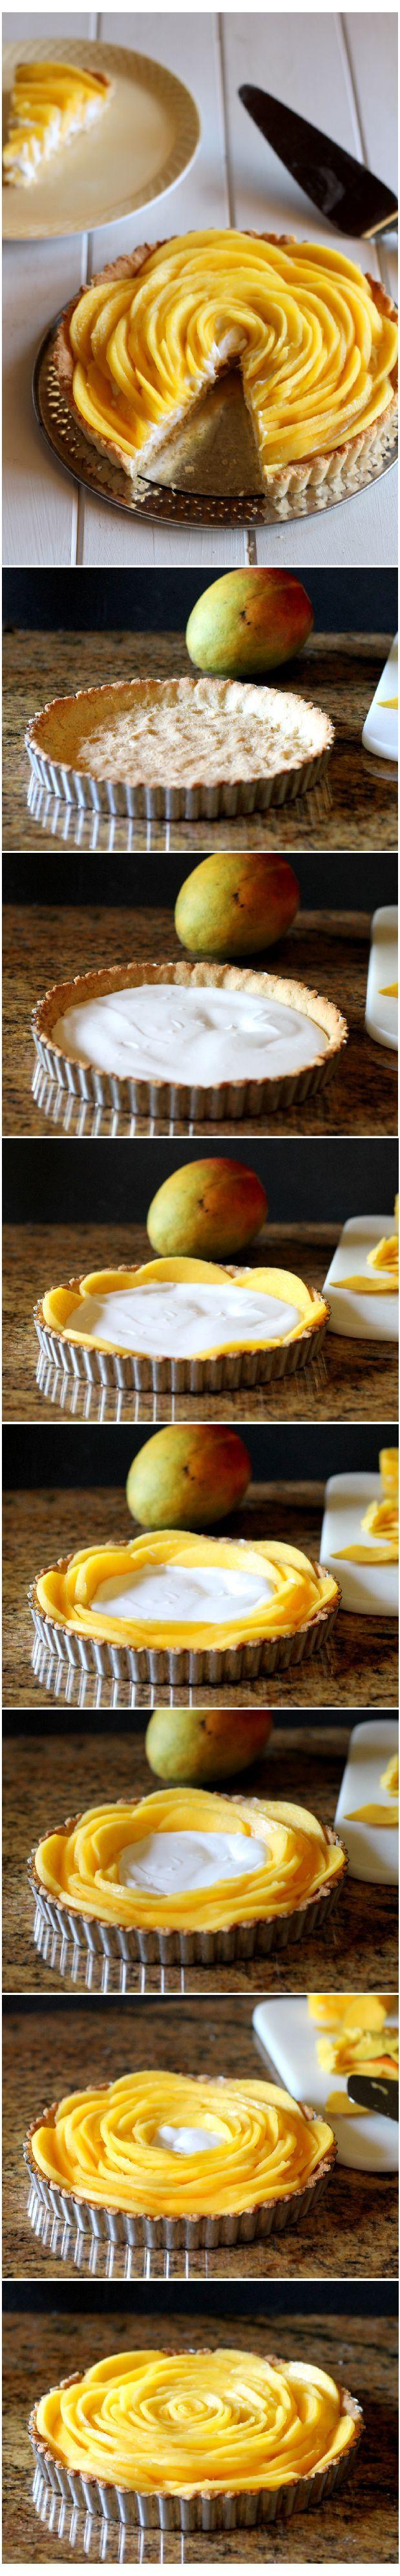 Mango Tart (Gluten Free, Paleo, Vegan, Refined Sugar Free)